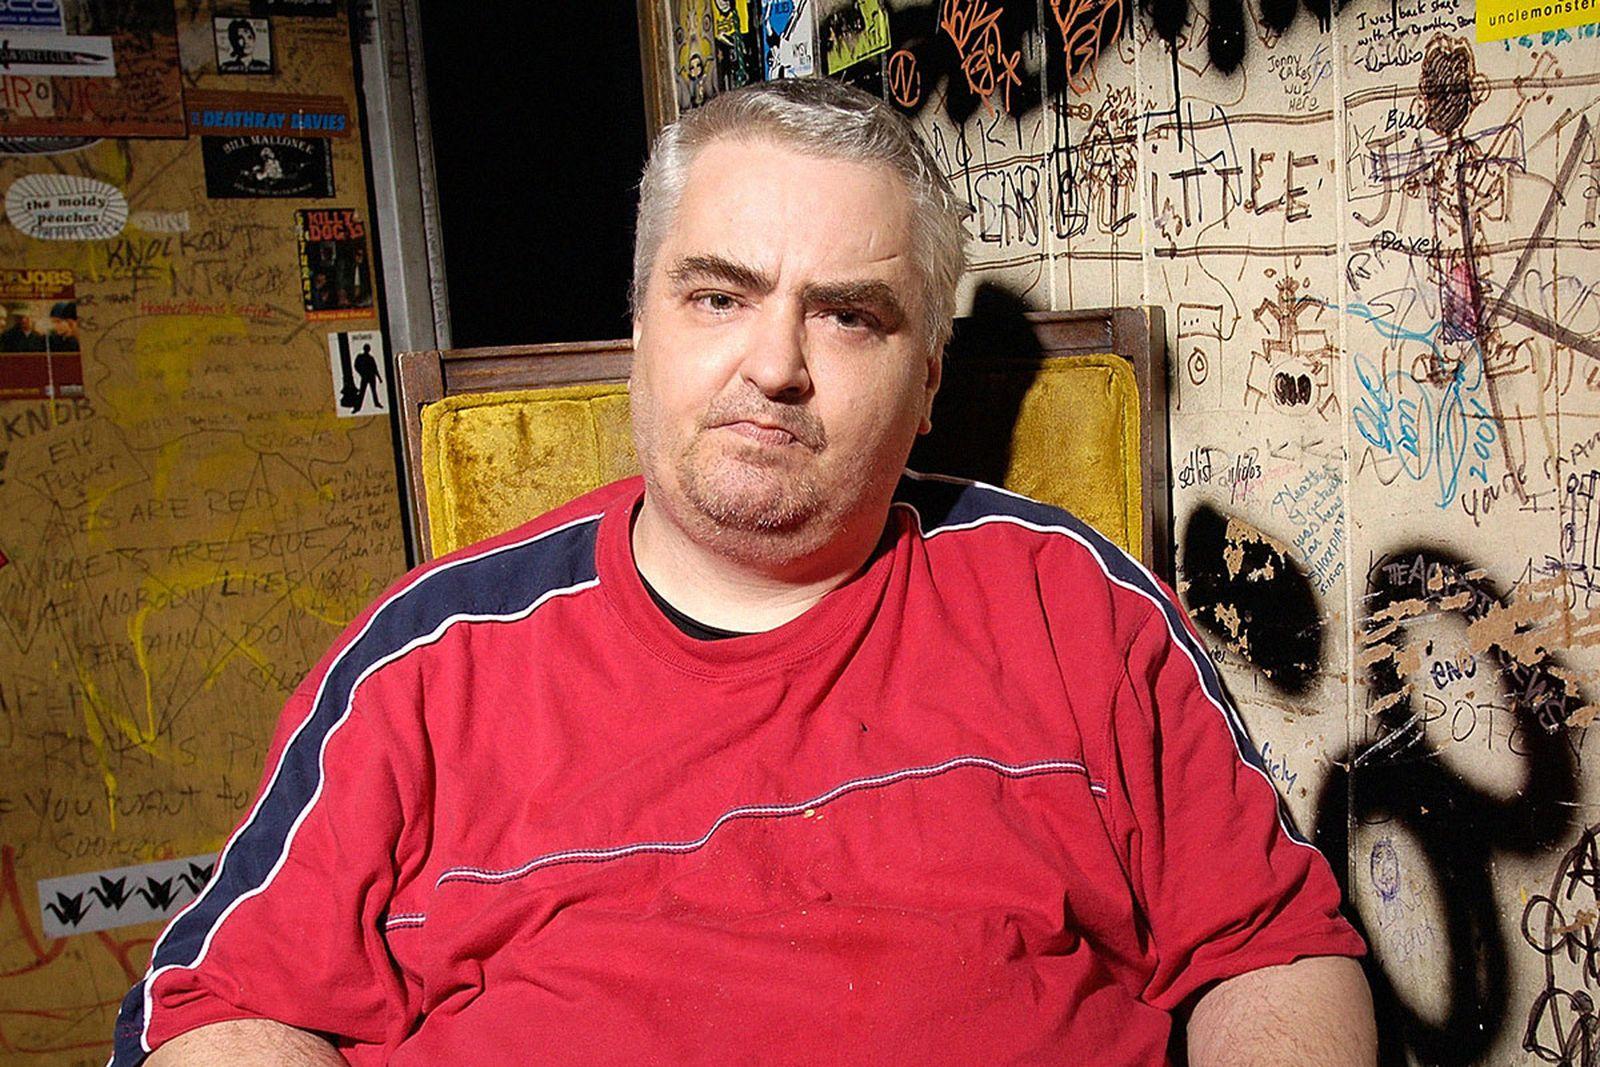 daniel johnston main Supreme kurt cobain nirvana